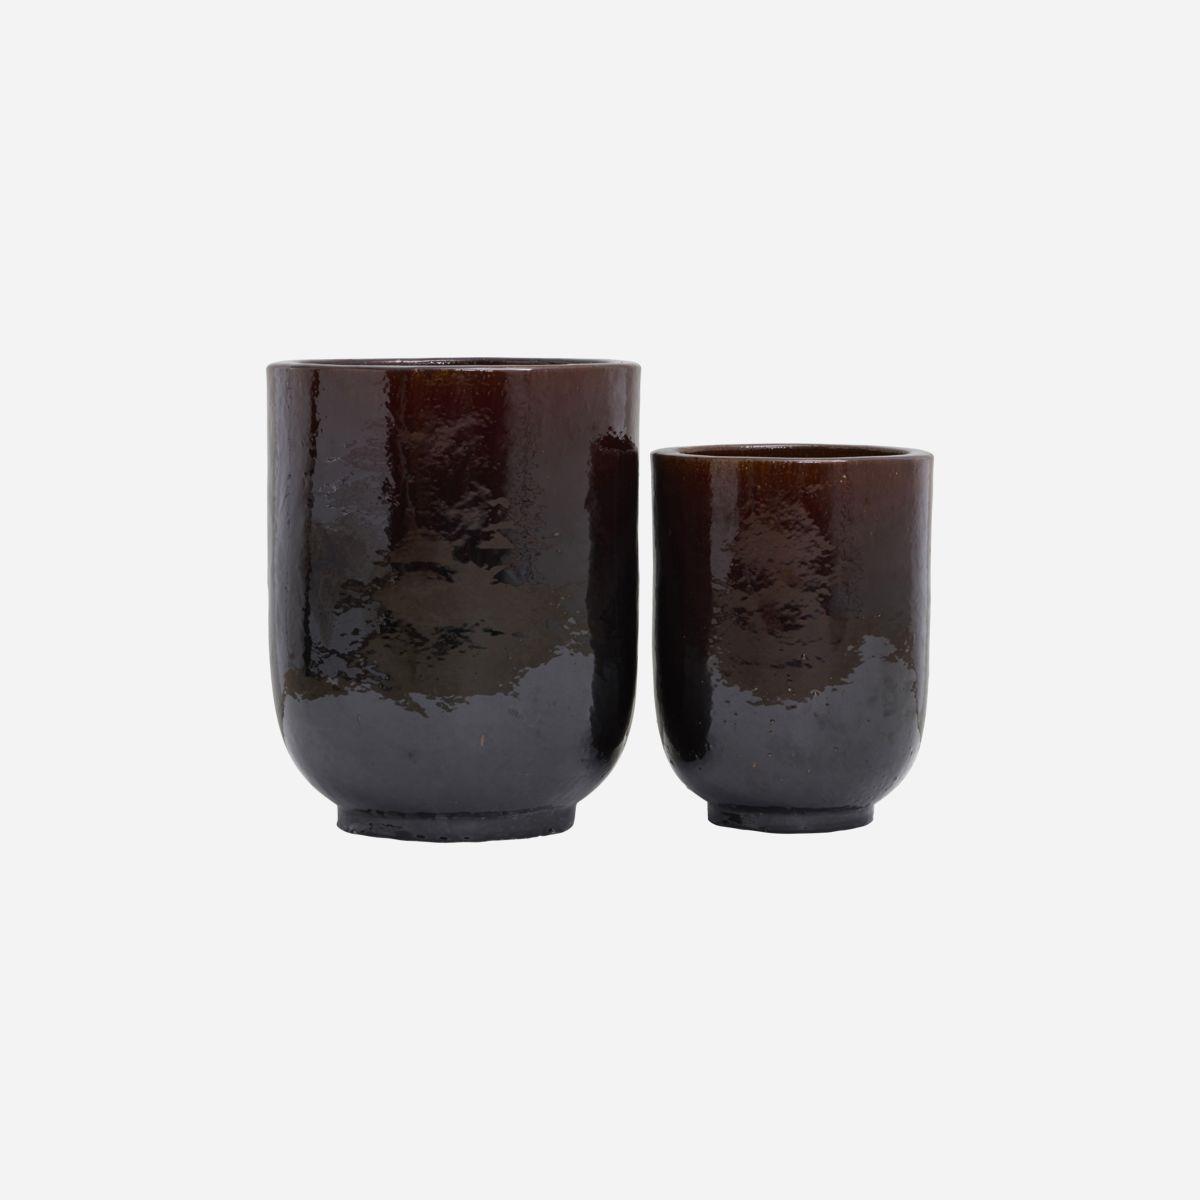 PHO havekrukker – sæt med 2 stk. – Mørkebrun fra House Doctor